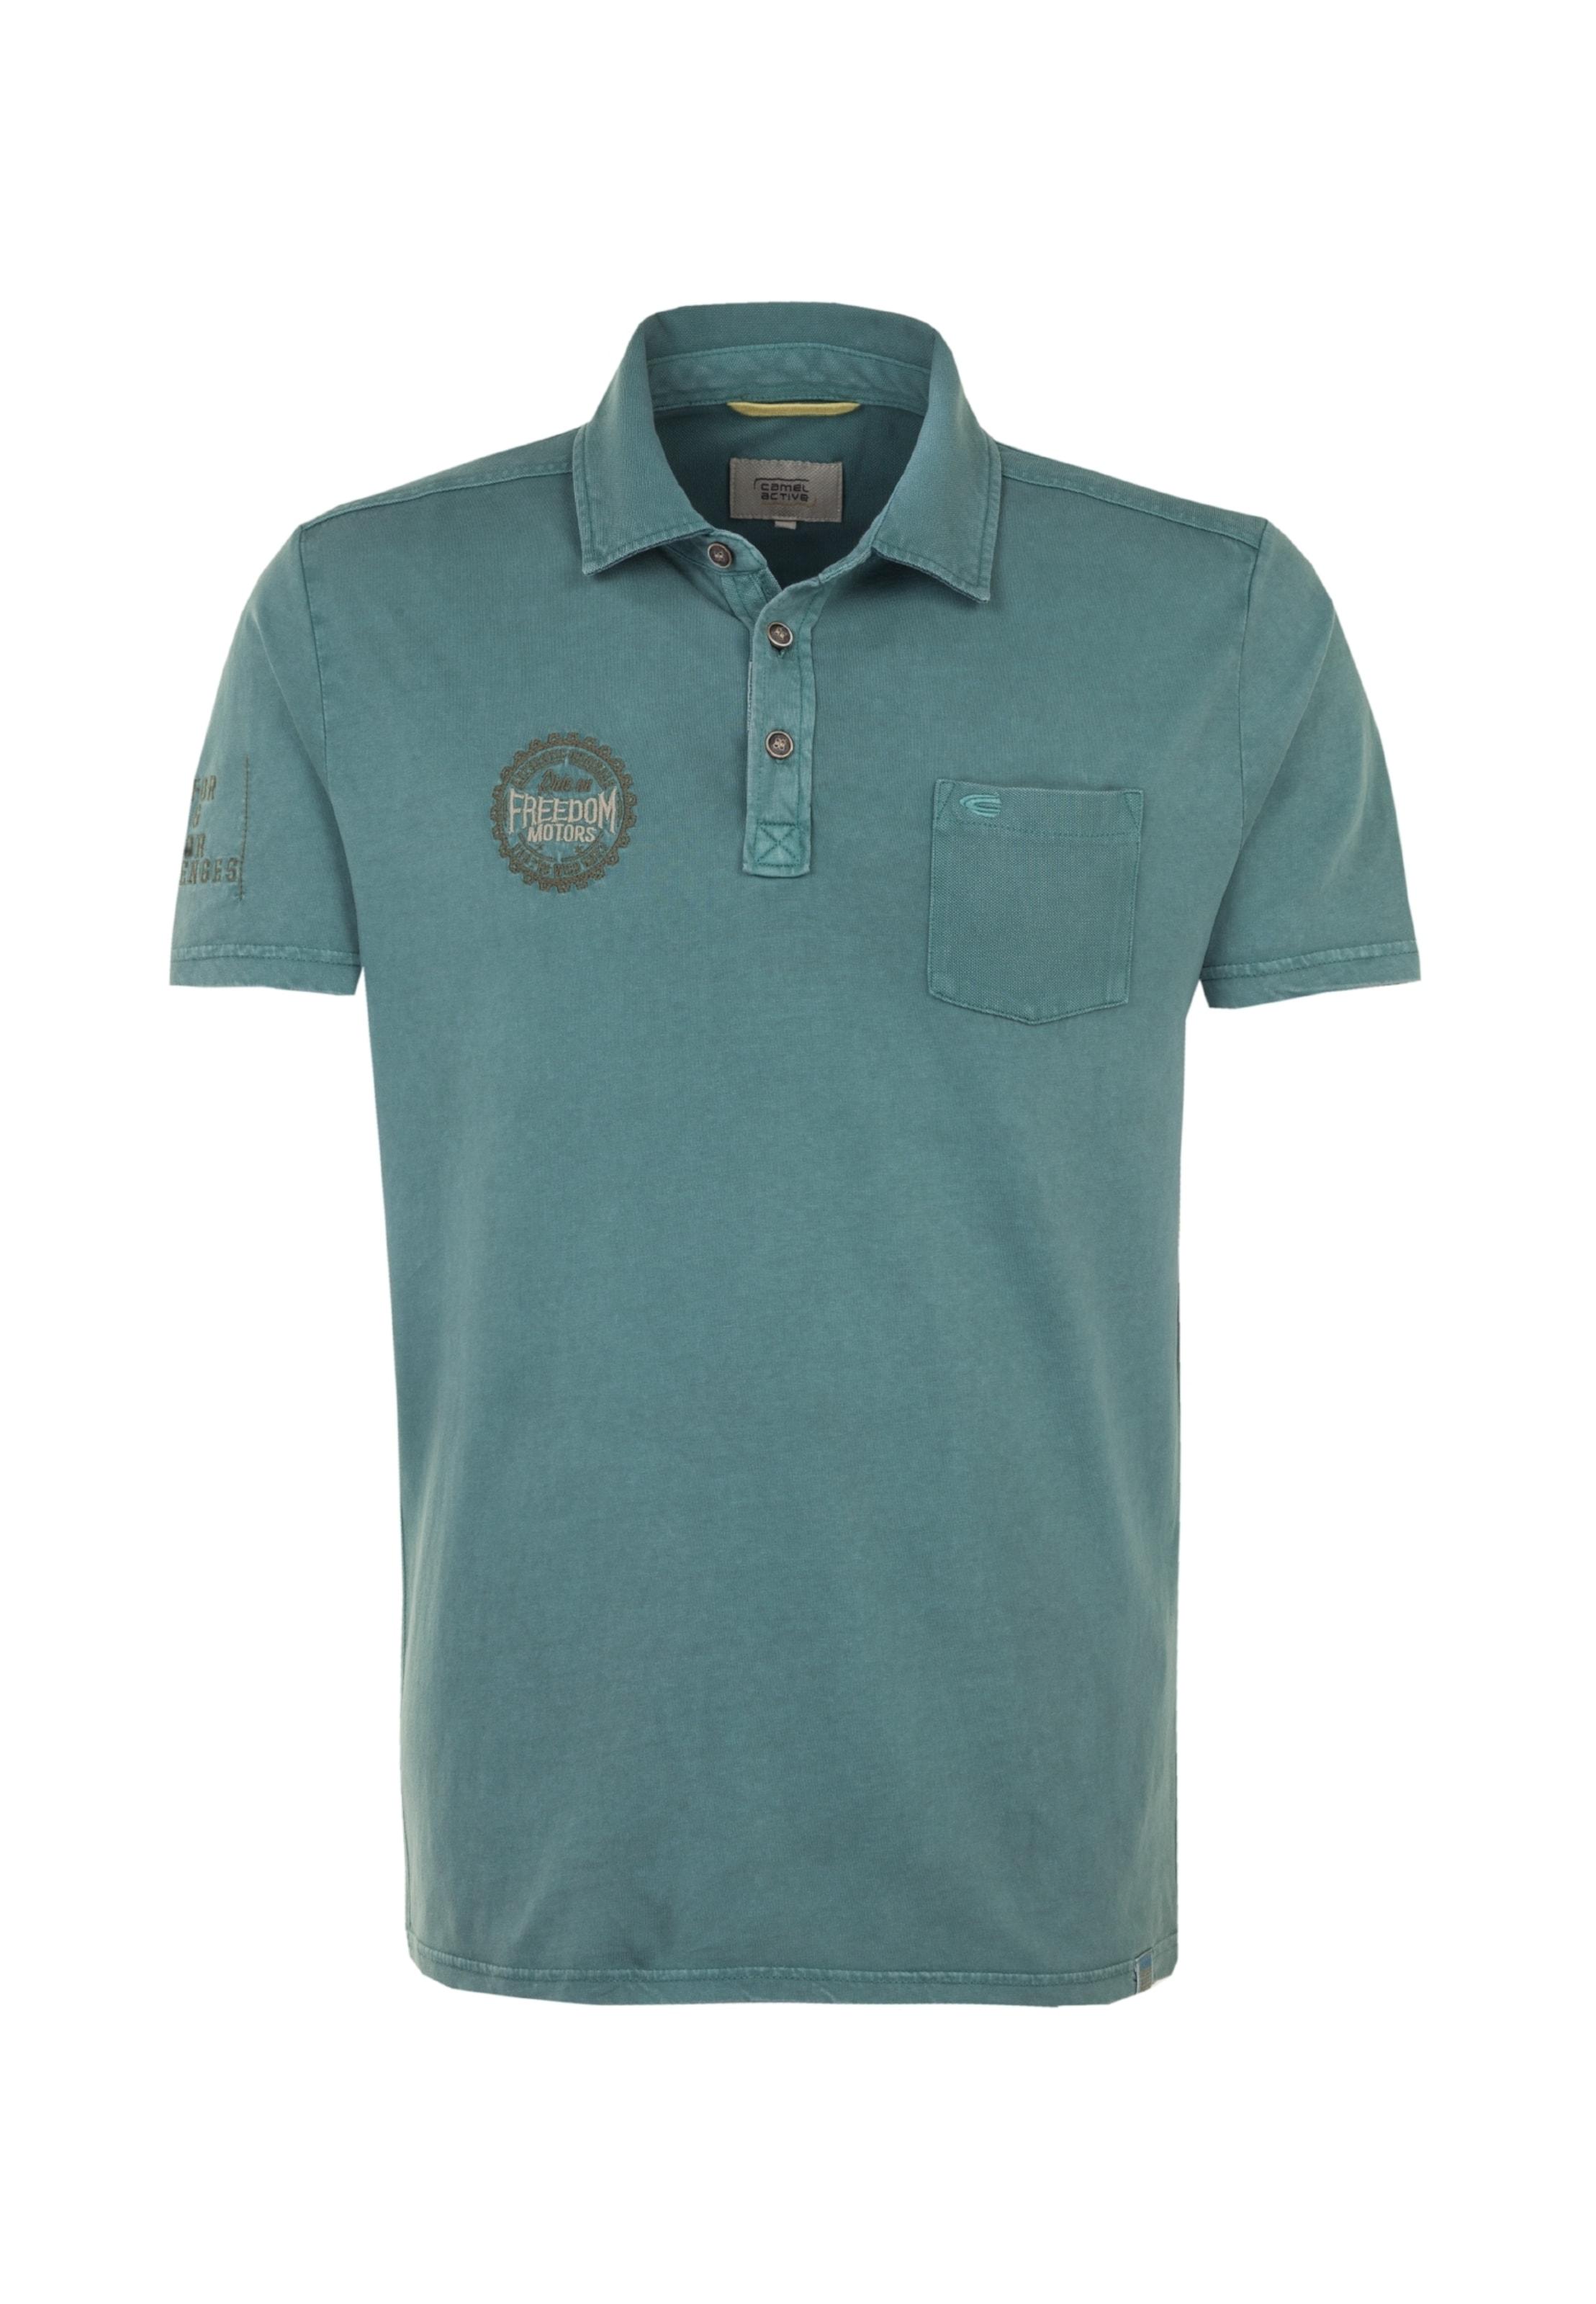 T Camel Active Bleu En Marine shirt 9DIWE2H